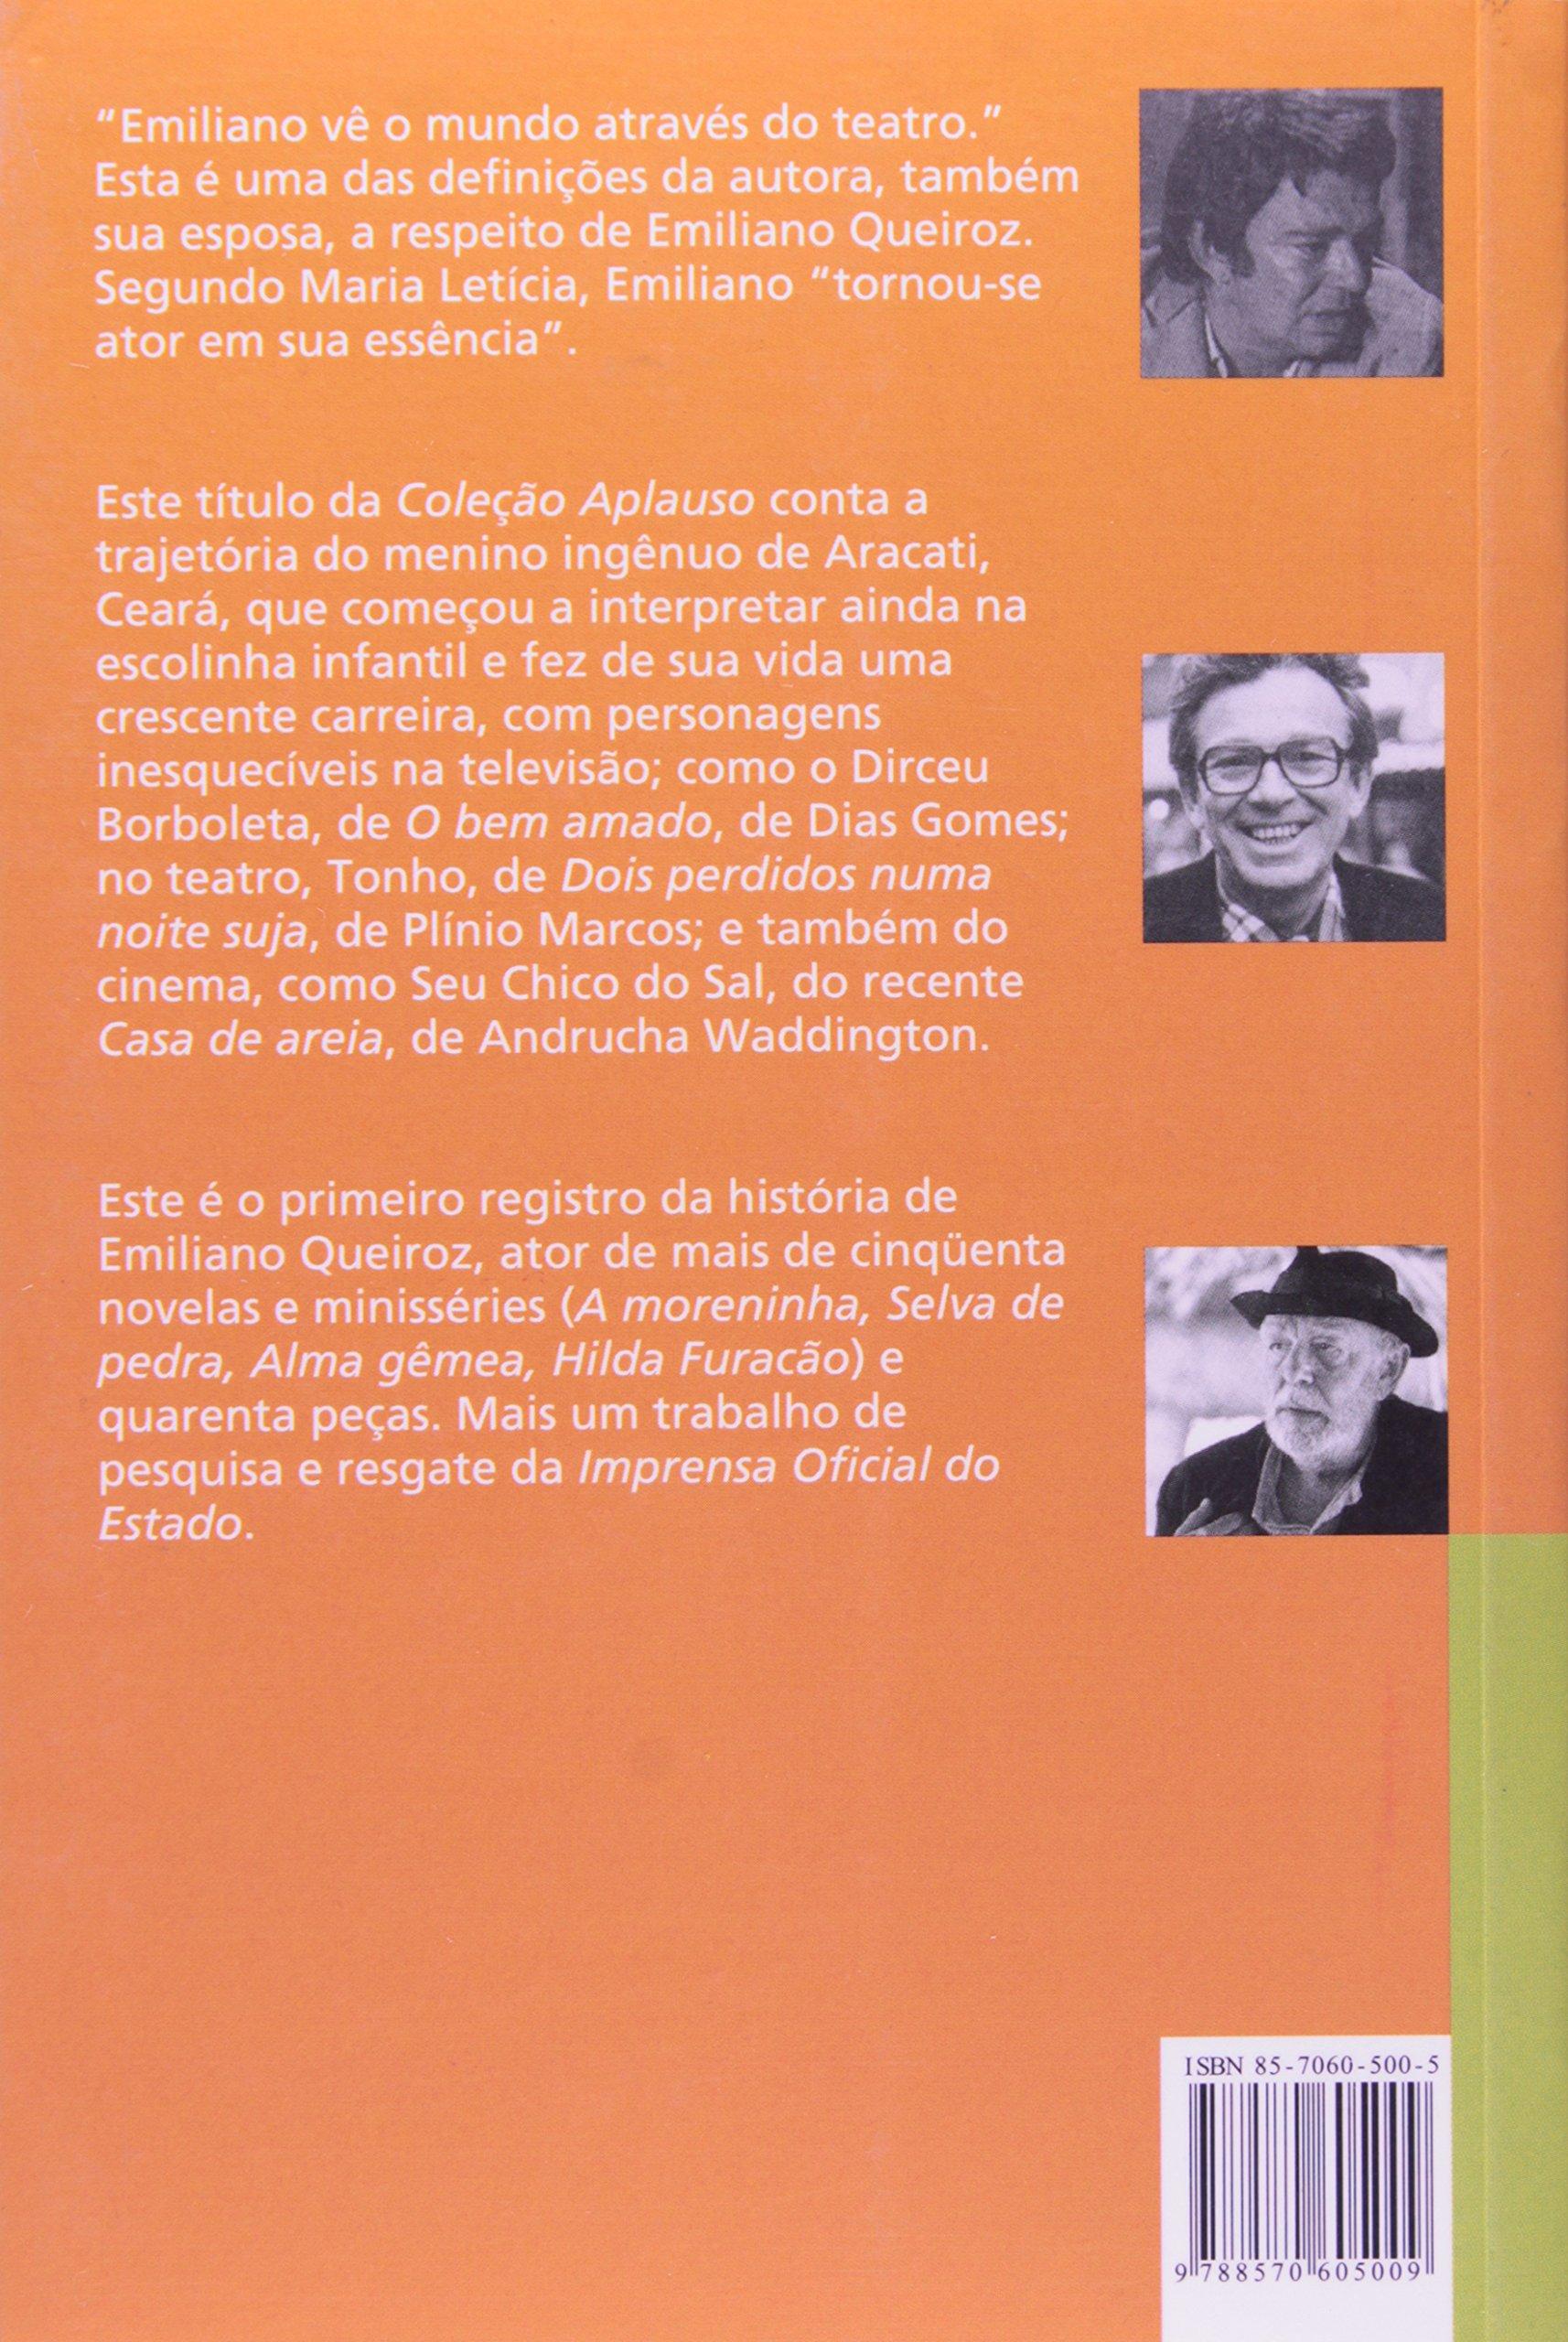 Emiliano Queiroz Na Sobremesa Da Vida Leticia Maria 9788570605009 Amazon Com Books